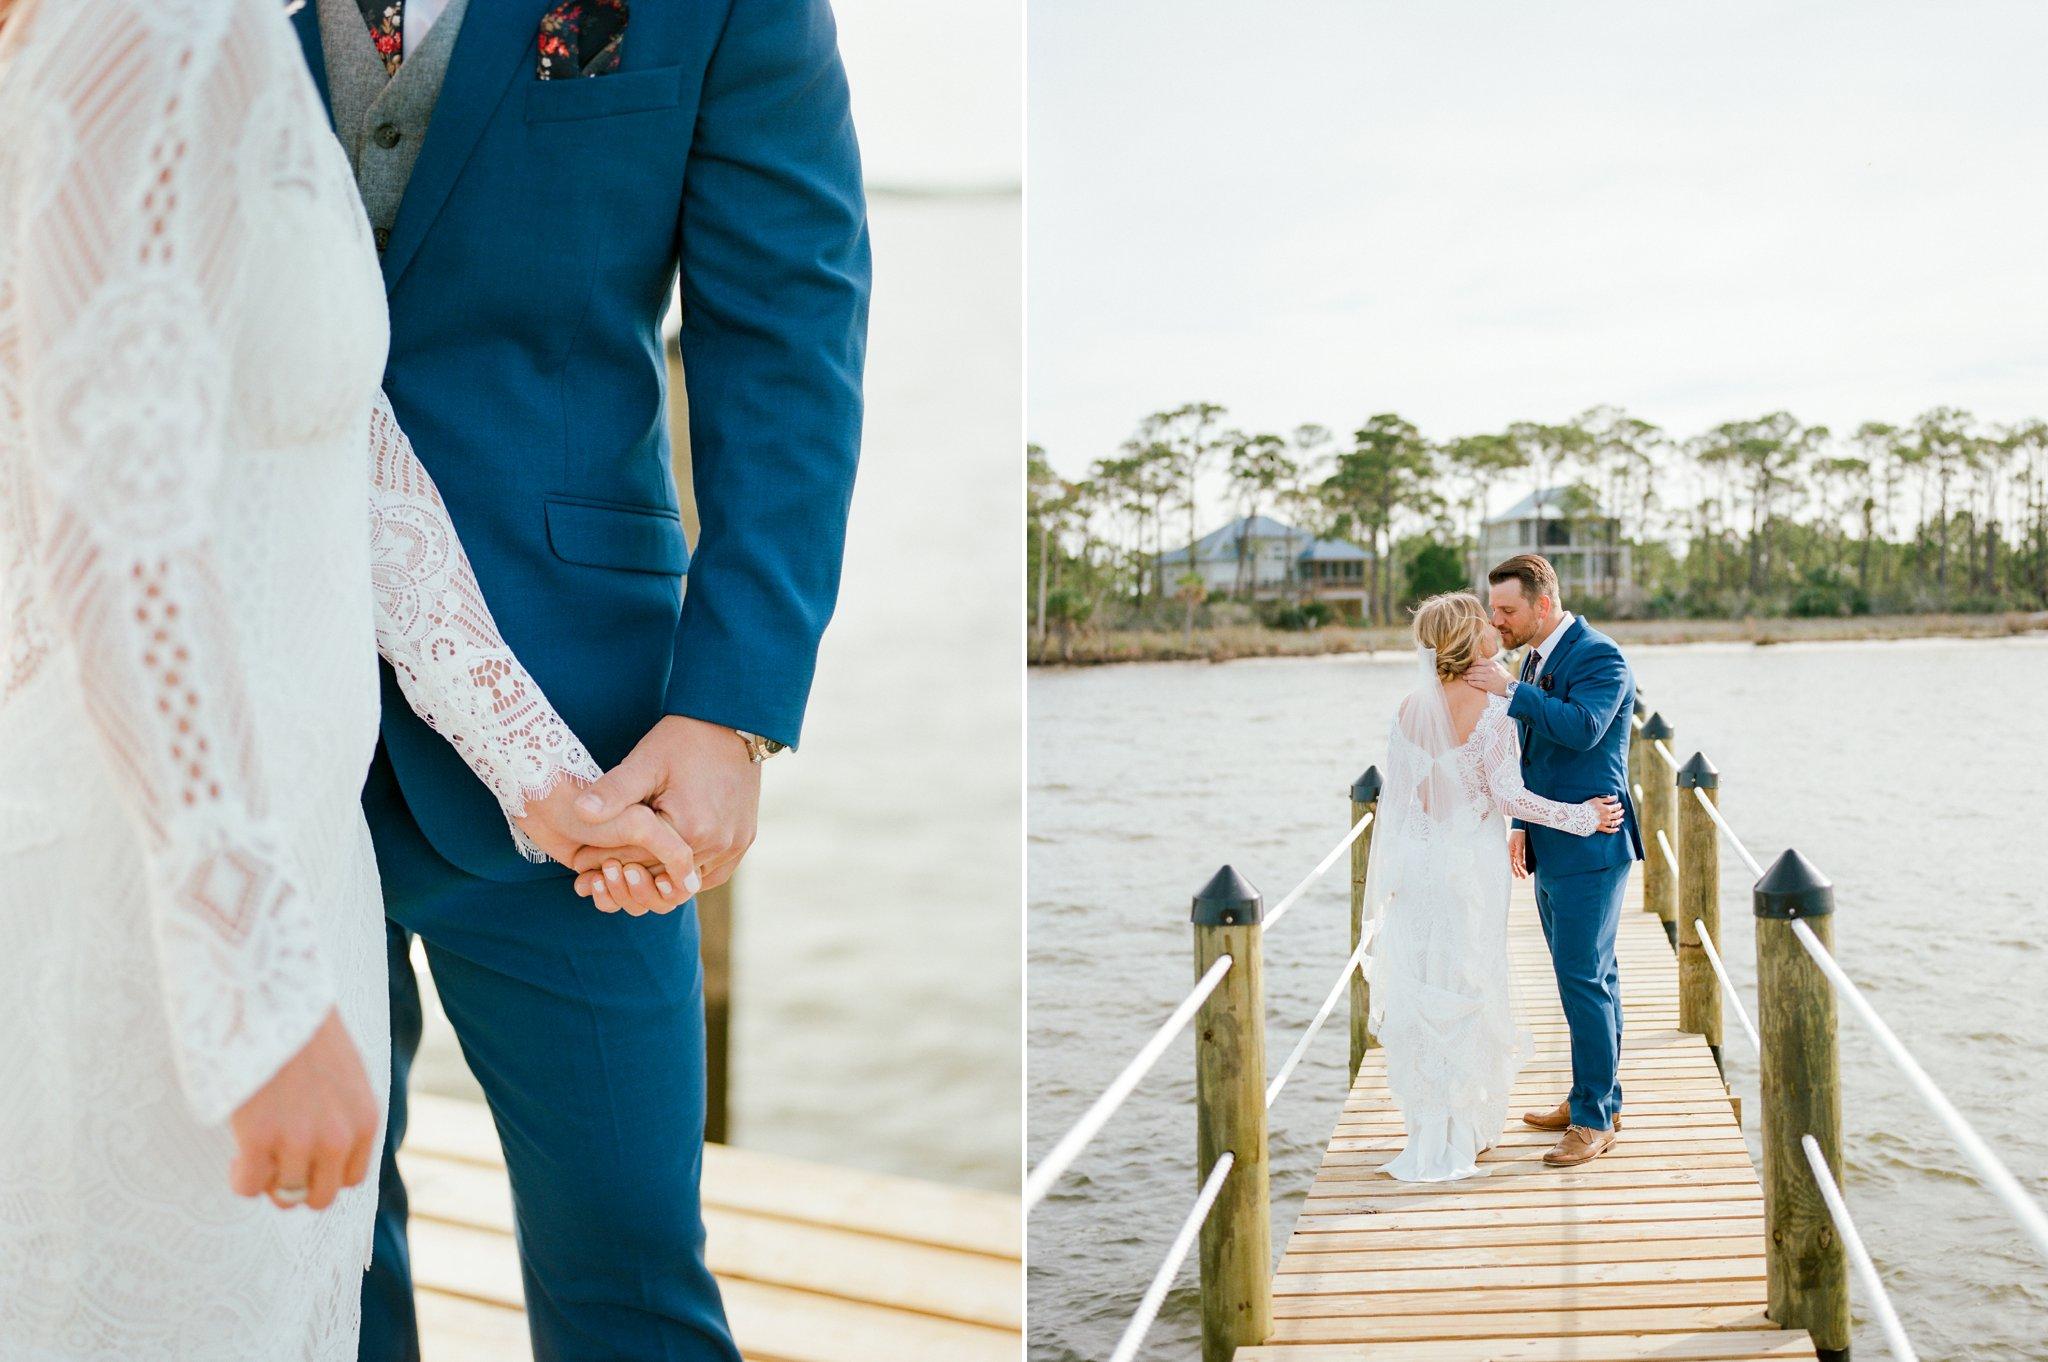 st+george+island+wedding+st+george+island+photographer+shannon+griffin+photography_0053.jpg